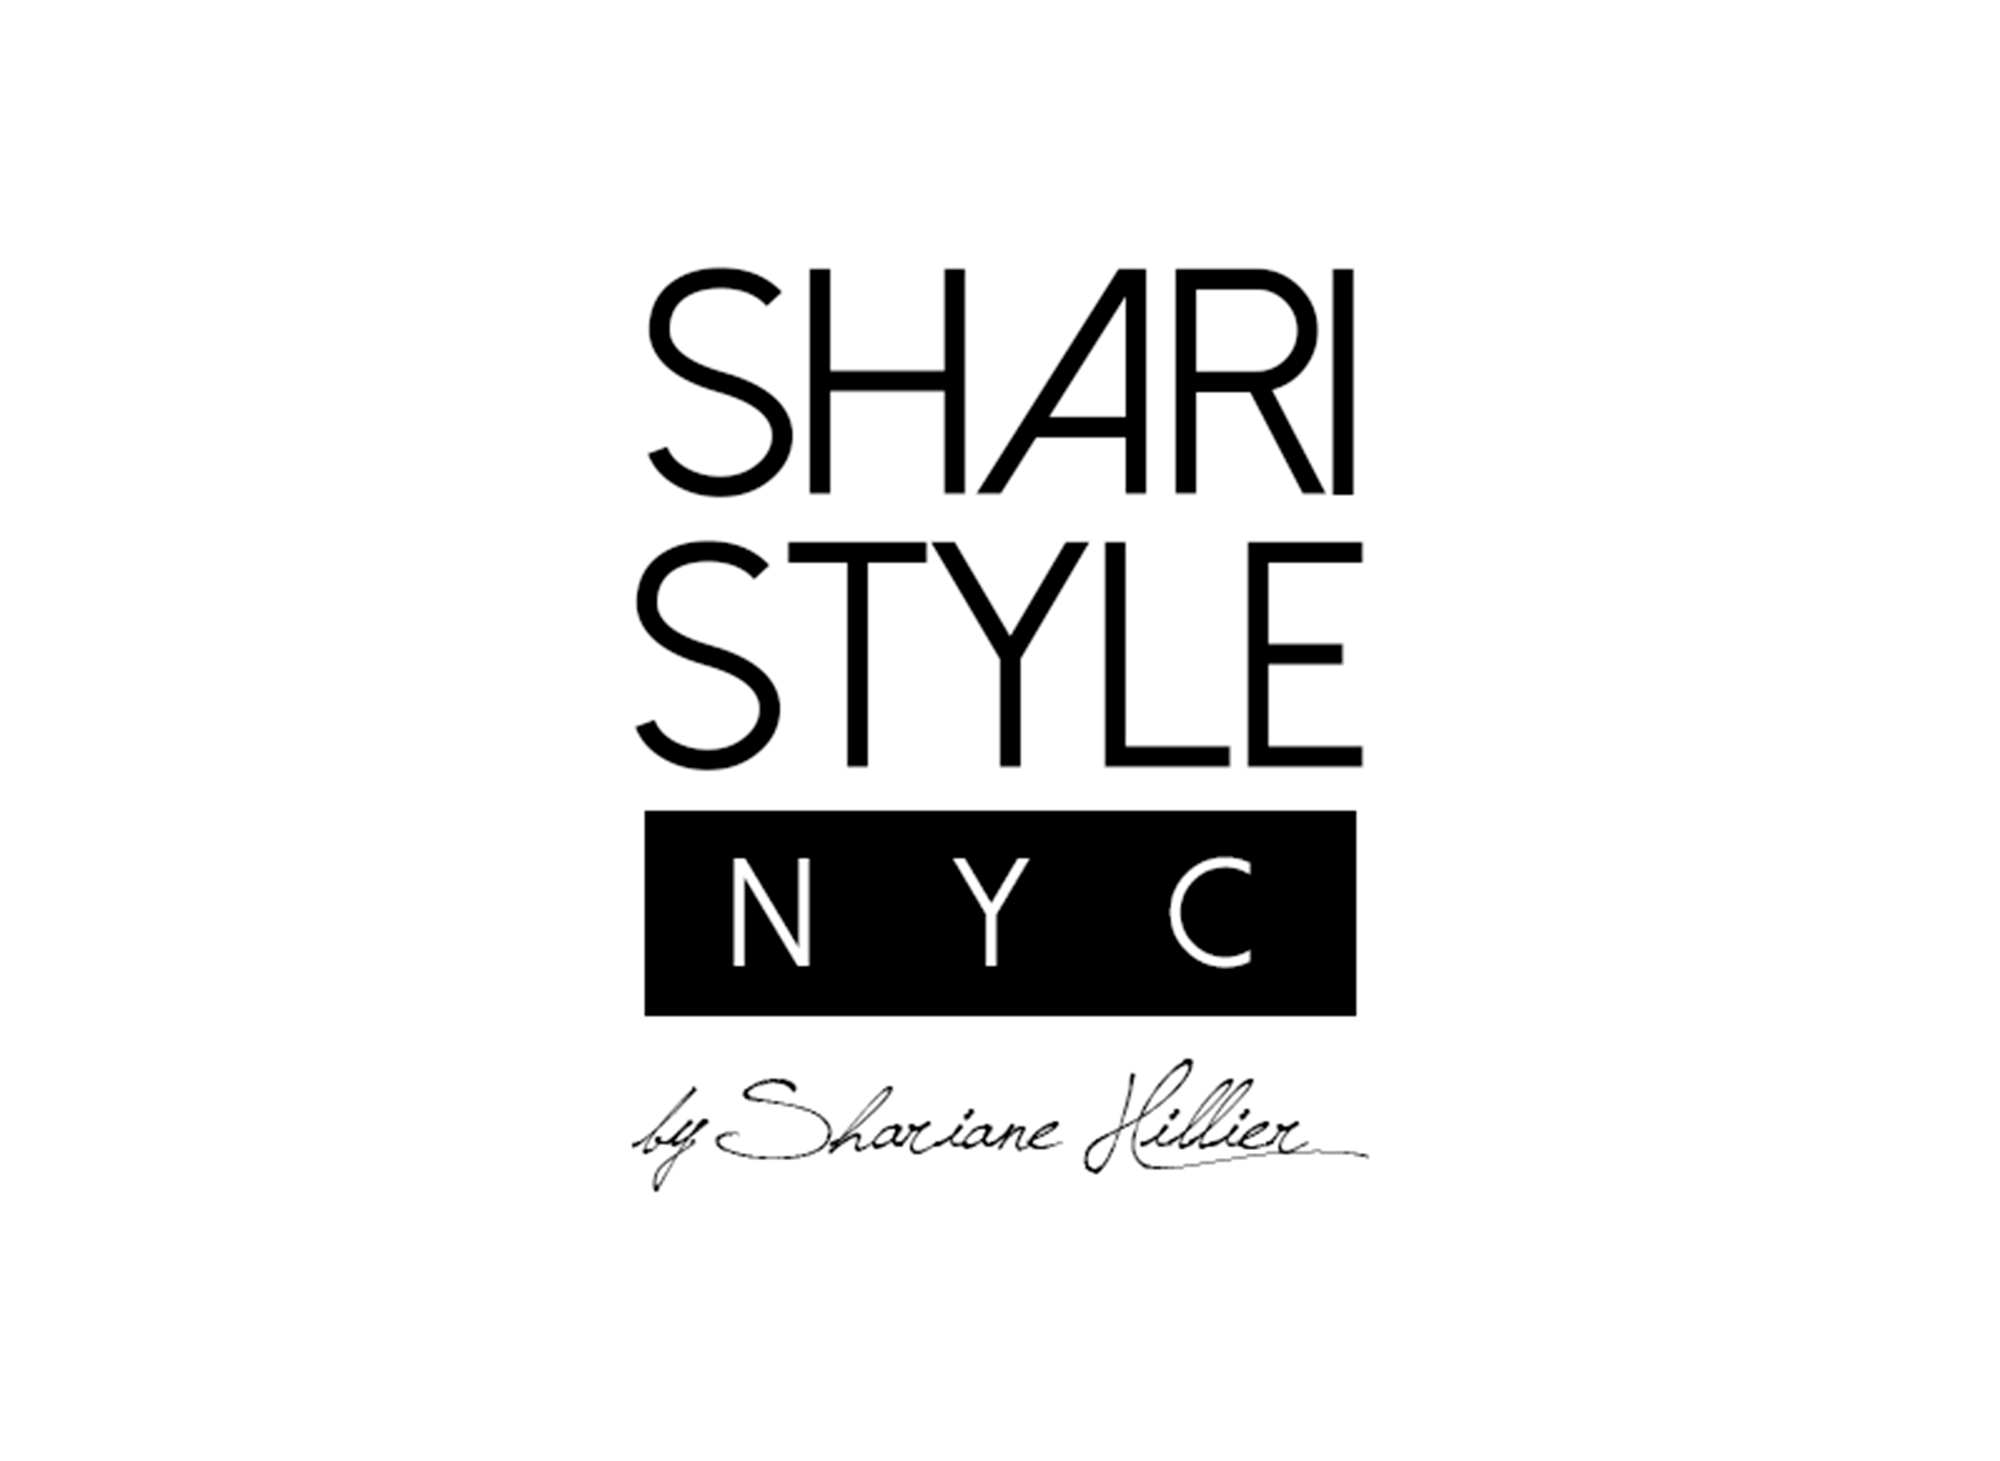 blog-shari-style-nyc-clientes-atendidos-agencia-diretriz-digital-marketing-fortaleza